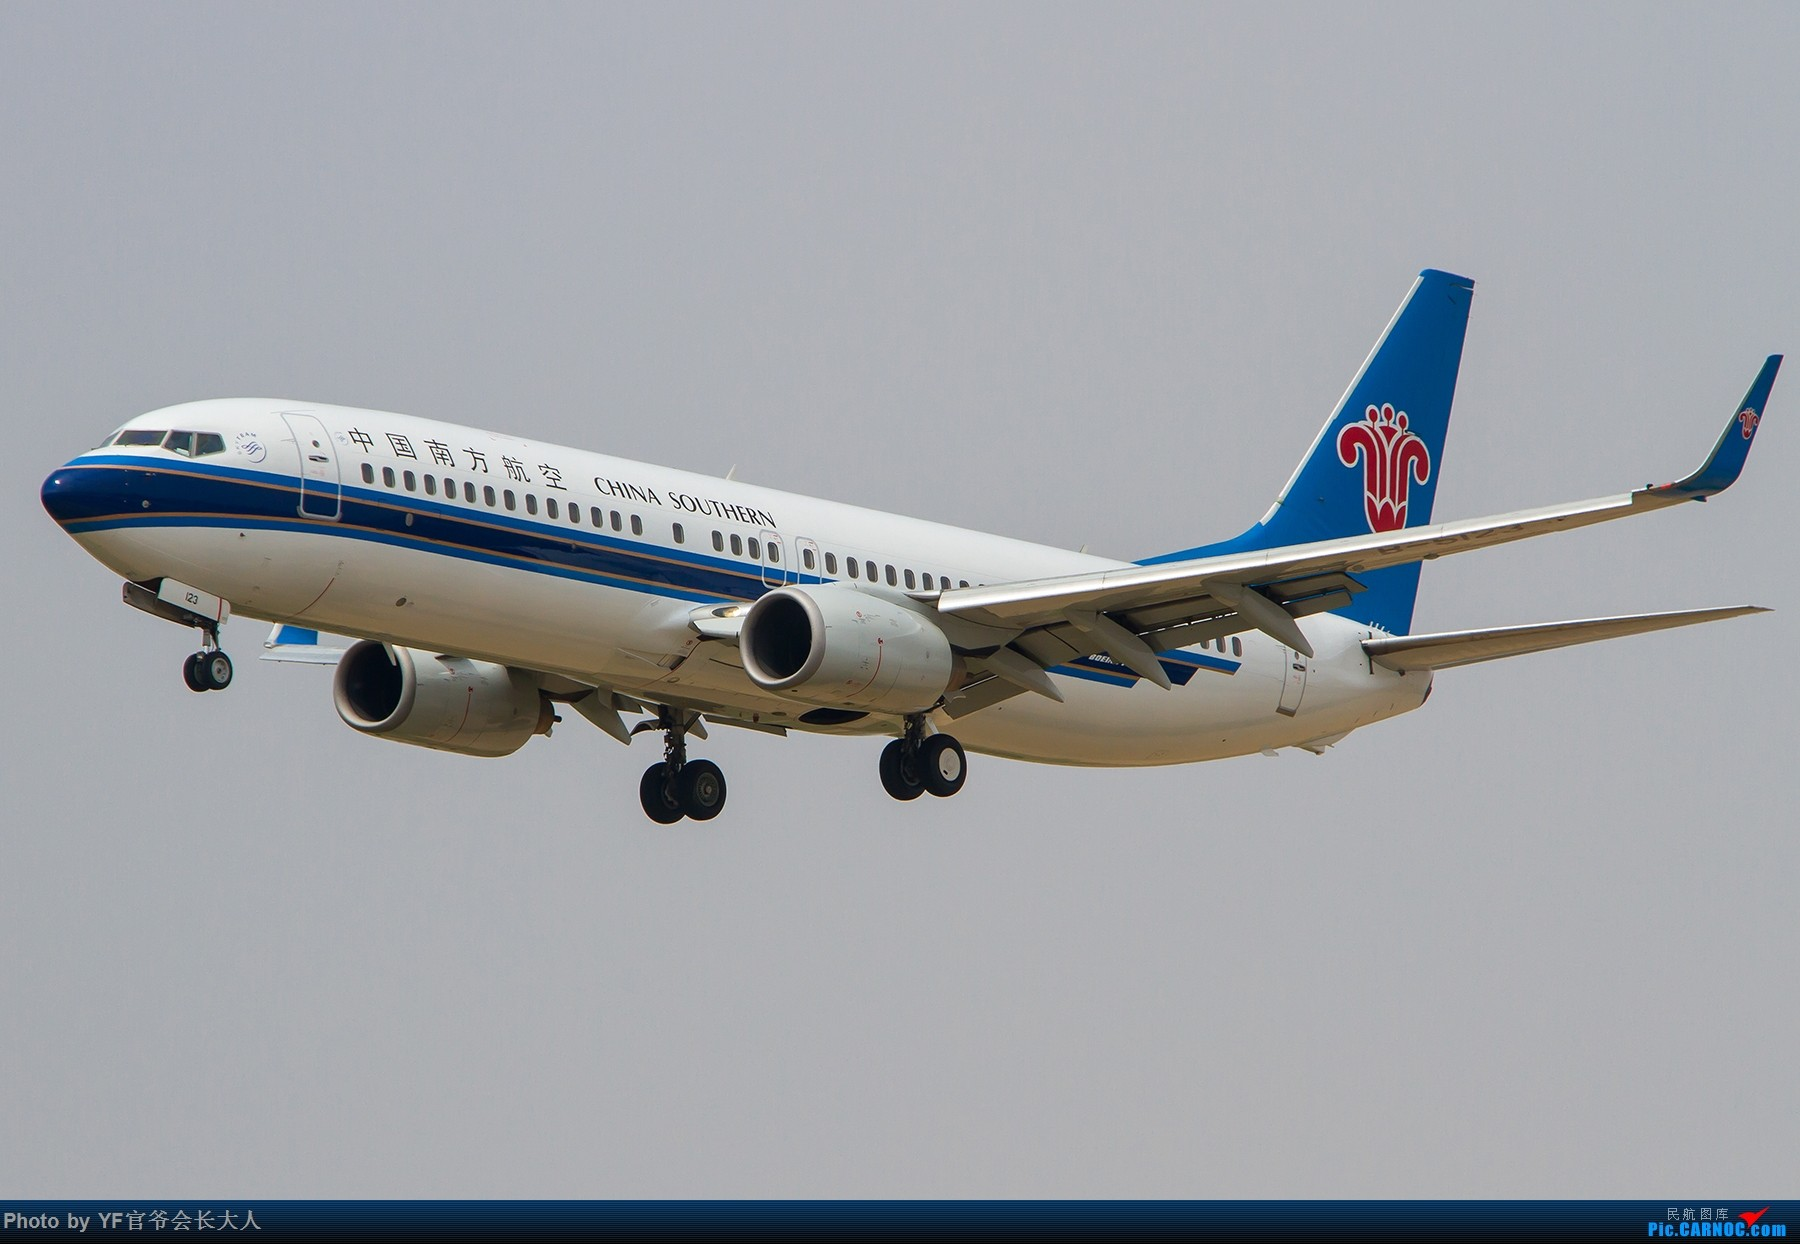 Re:[原创]【ZYTX】轻易不拍机,拍就要拍个过瘾!(新开的酷鸟,亚洲大西洋,顺带碰上朝韩两国的好货) BOEING 737-800 B-5123 中国沈阳桃仙国际机场